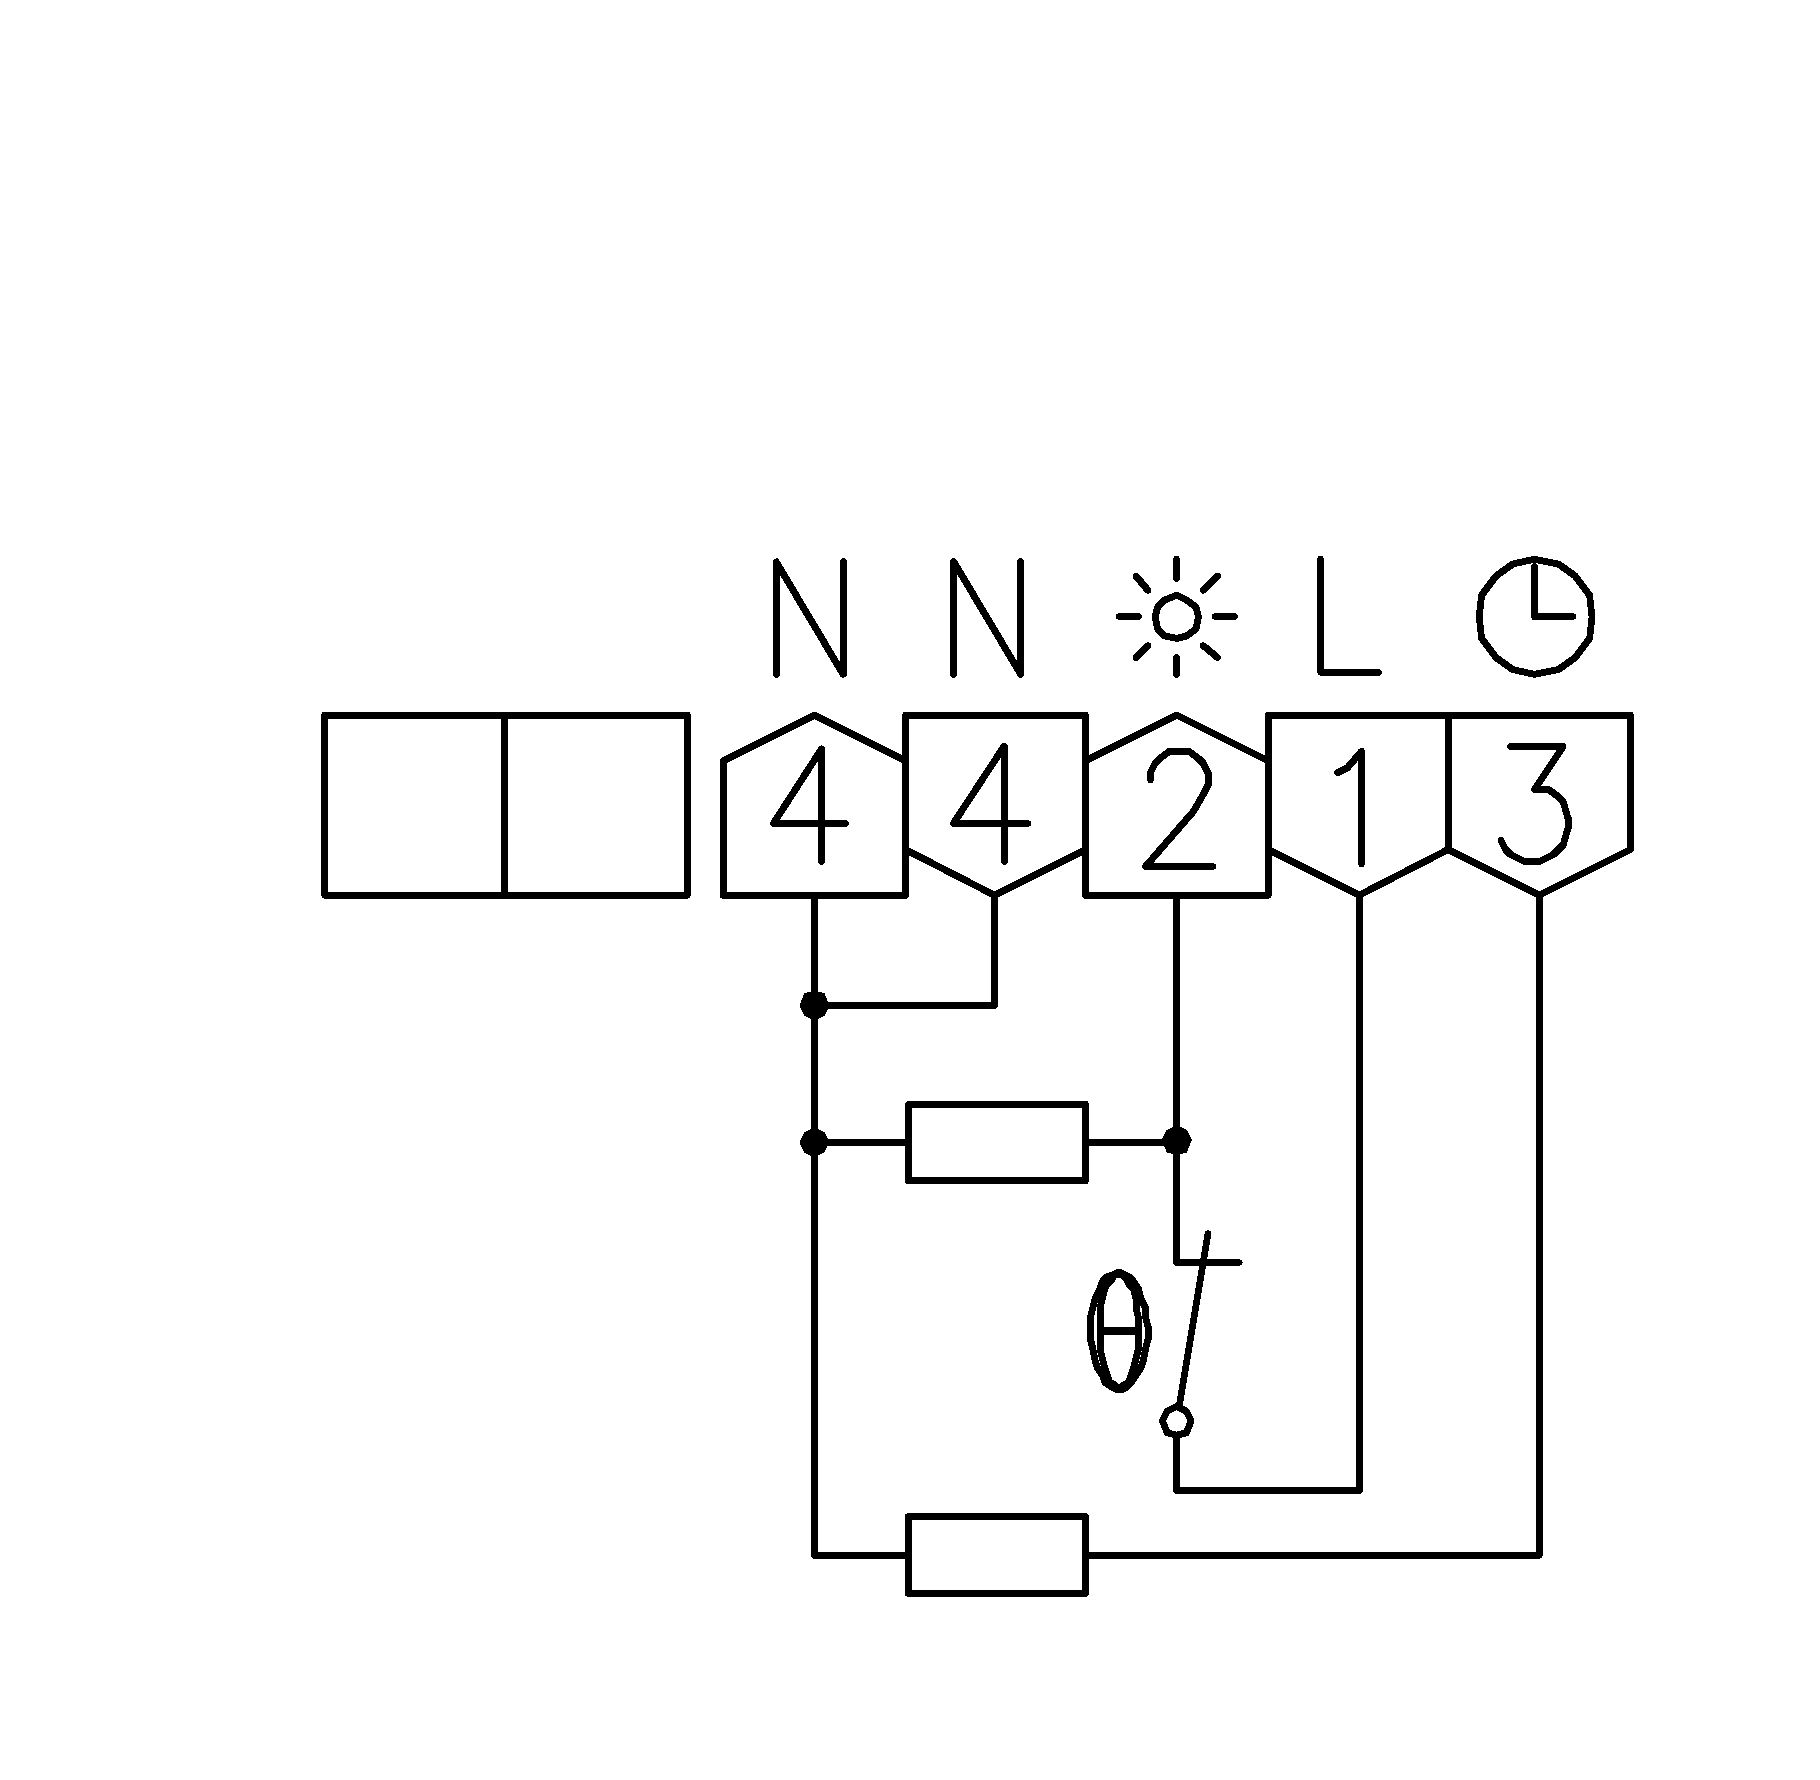 MA010100 Circuit diagram